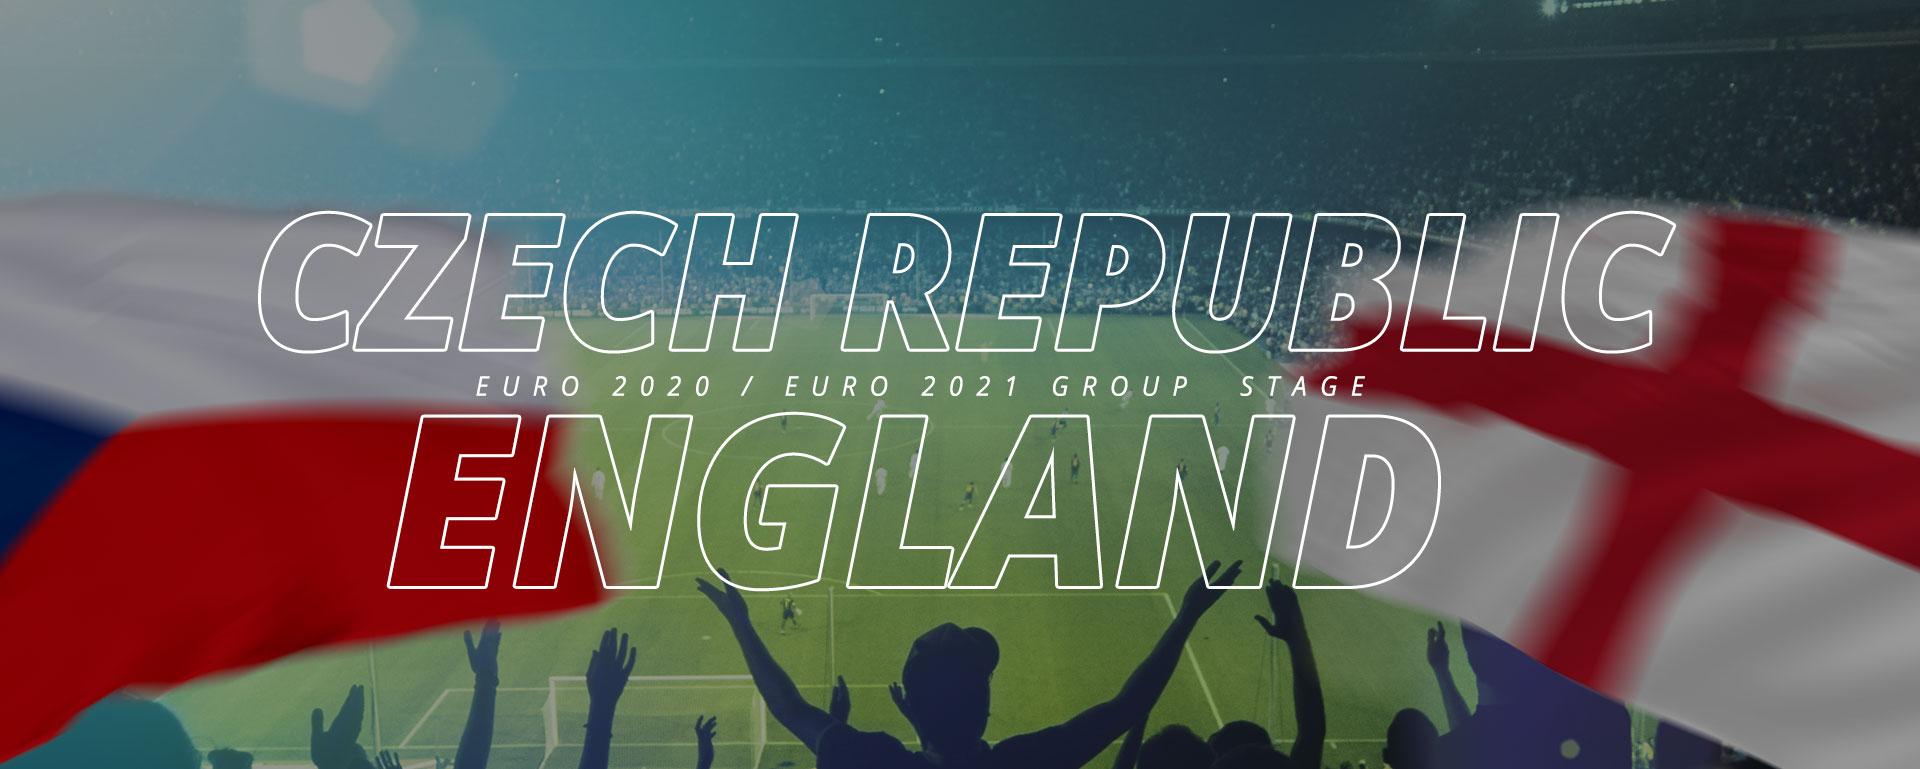 CZECH REPUBLIC VS ENGLAND